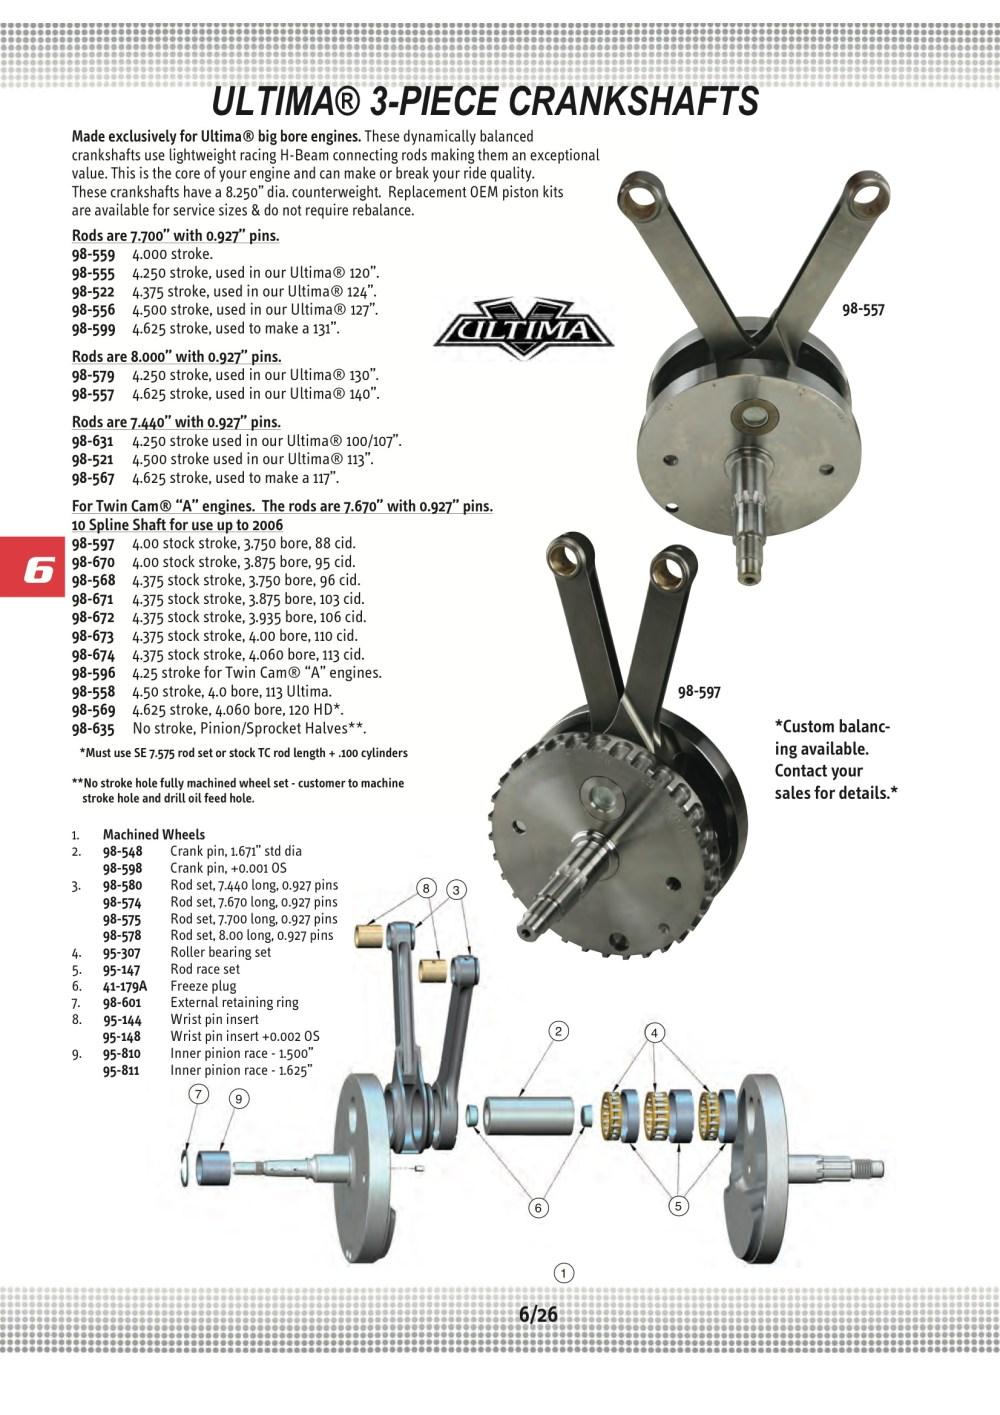 medium resolution of ultima crank assy 4 00 twin cam a 88ci midwest 98 597 harley davidson 88ci engine diagram